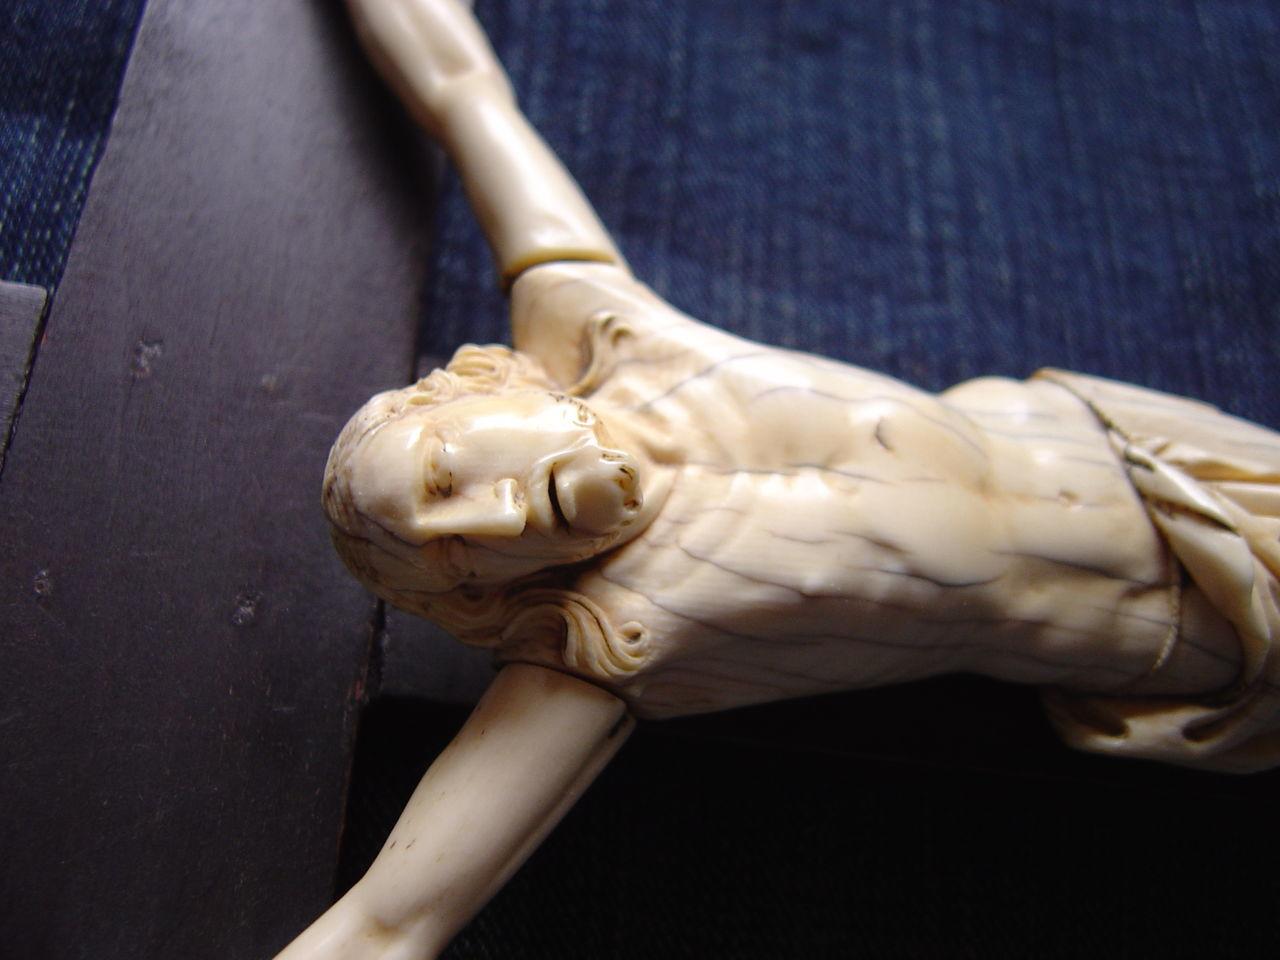 Close up of an antique crucifix, impressive sculpture Antiques Arms Art And Craft Christ Close-up Collector Cross Crucifix Face Faith HEAD Human Body Part Indoors  Ivory Jesus Jesus Christ Male Man Mouth Religion Religious  Religious Art Sculpted Sculpture Torso